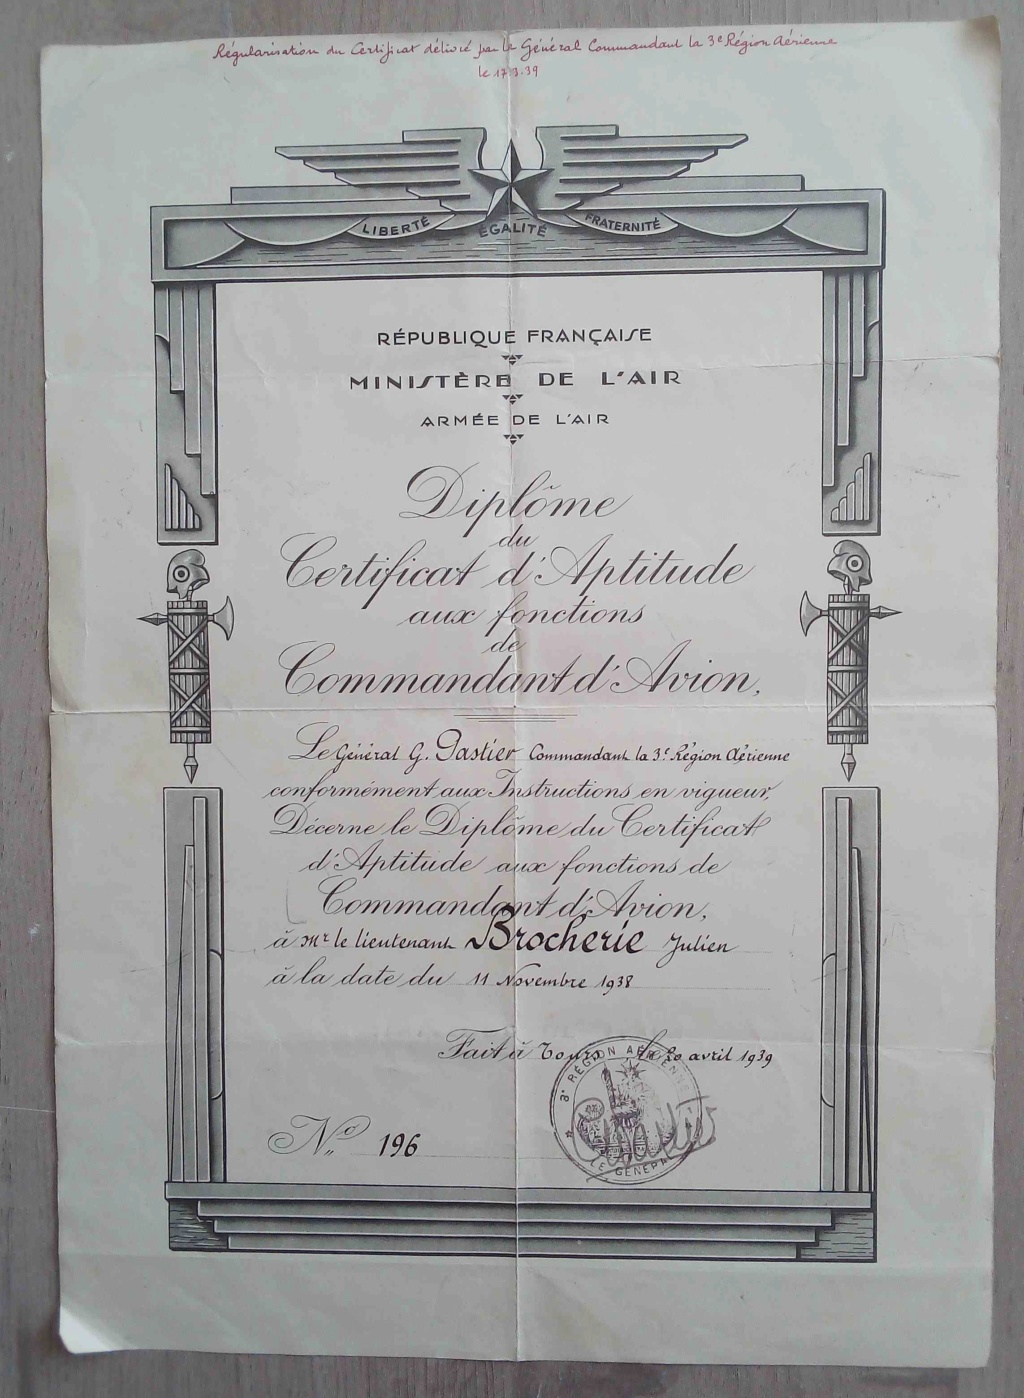 Brevets et diplomes de l'Armée de l'Air; Img_2032